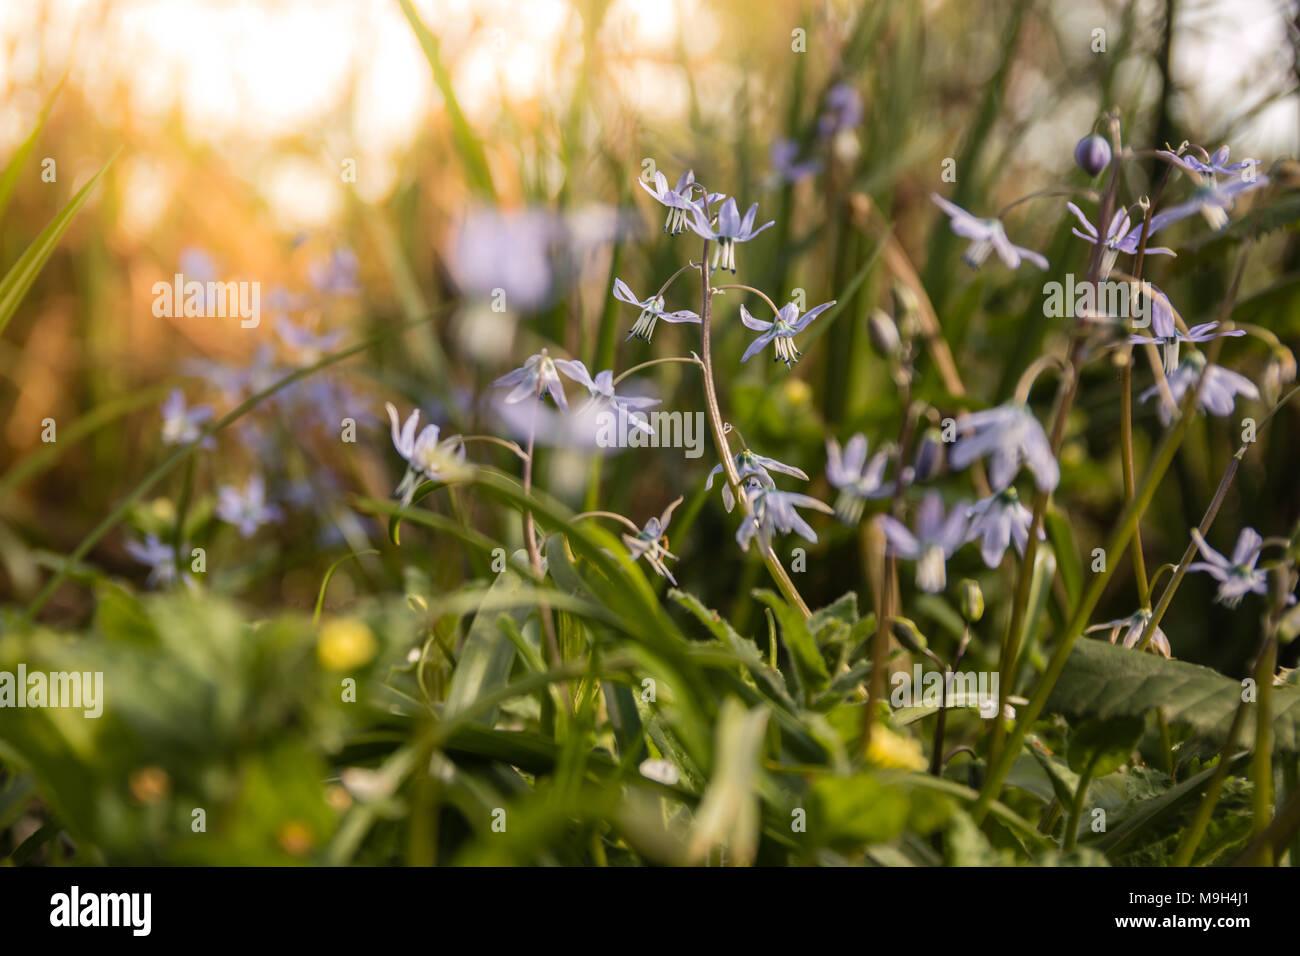 Scilla siberica Frühling Schönheit im Wald. Der Frühling ist vor der Tür. Stockbild